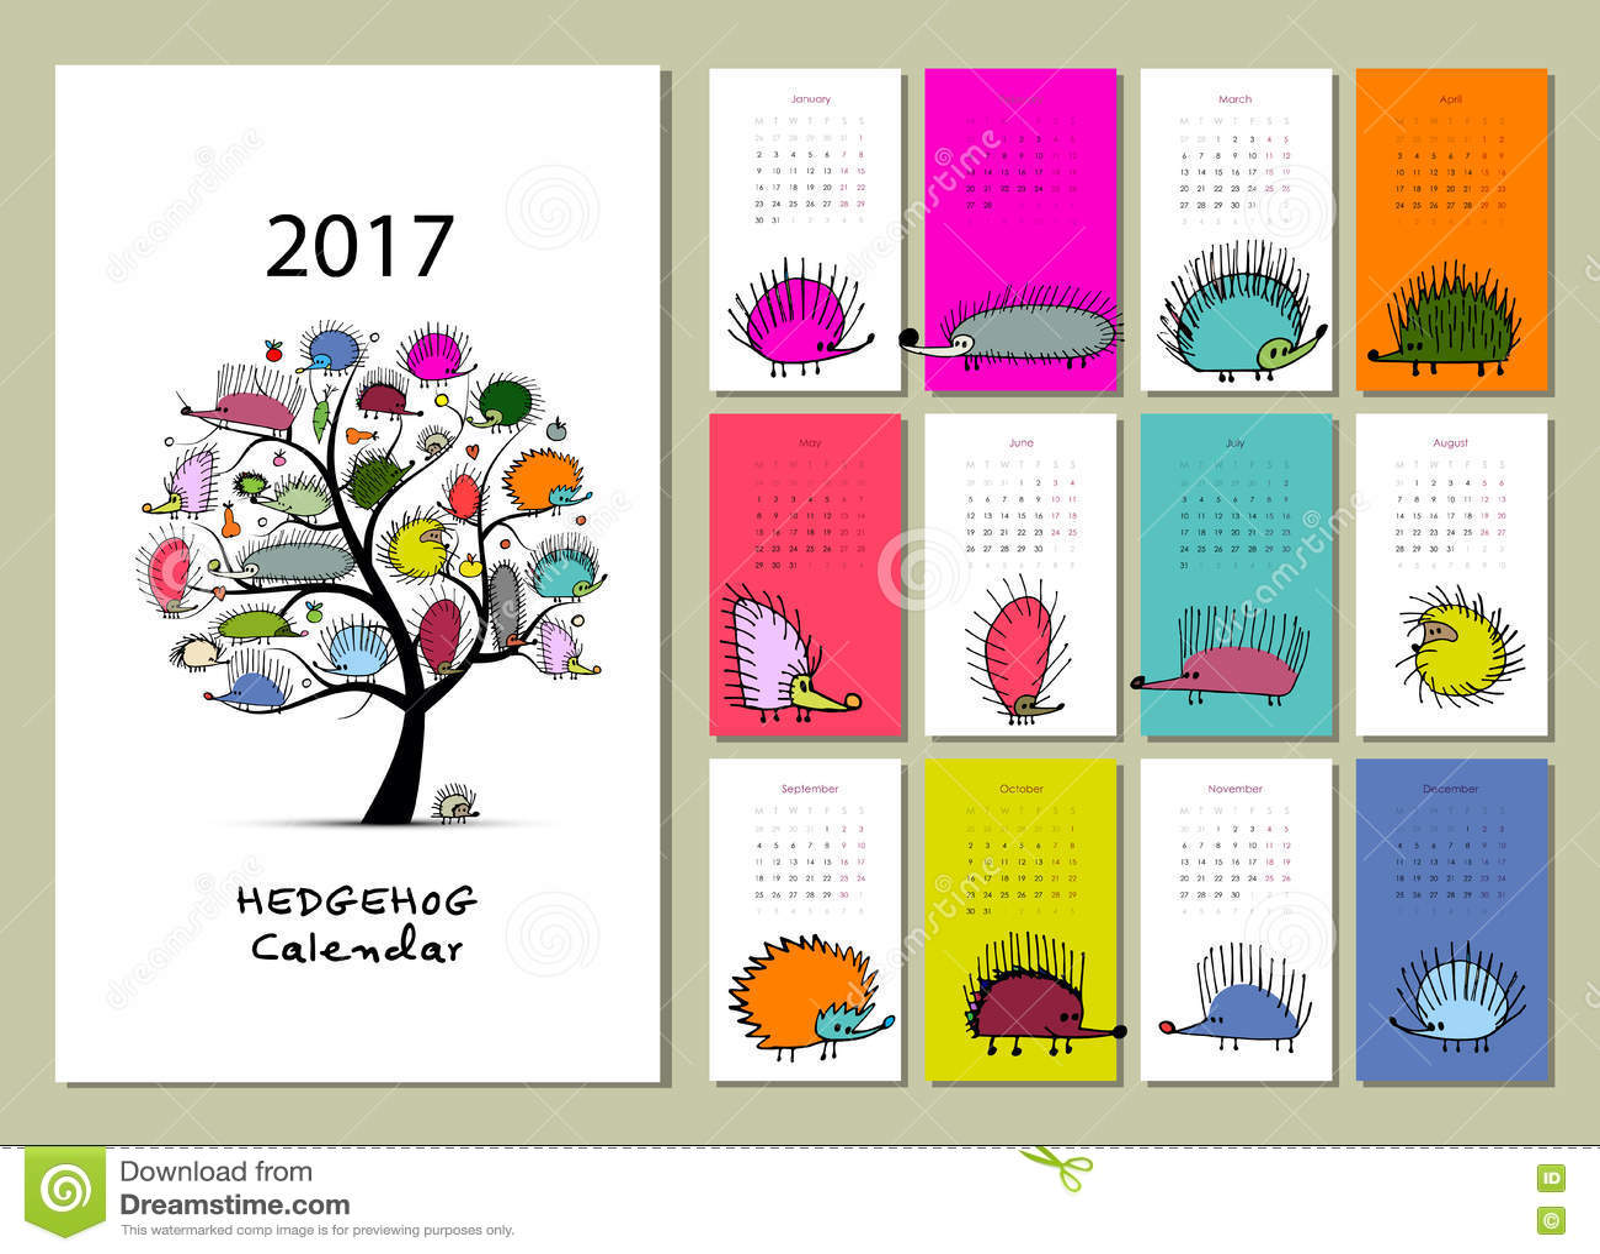 Illustration Calendar Design : Funny hedgehogs calendar design stock vector